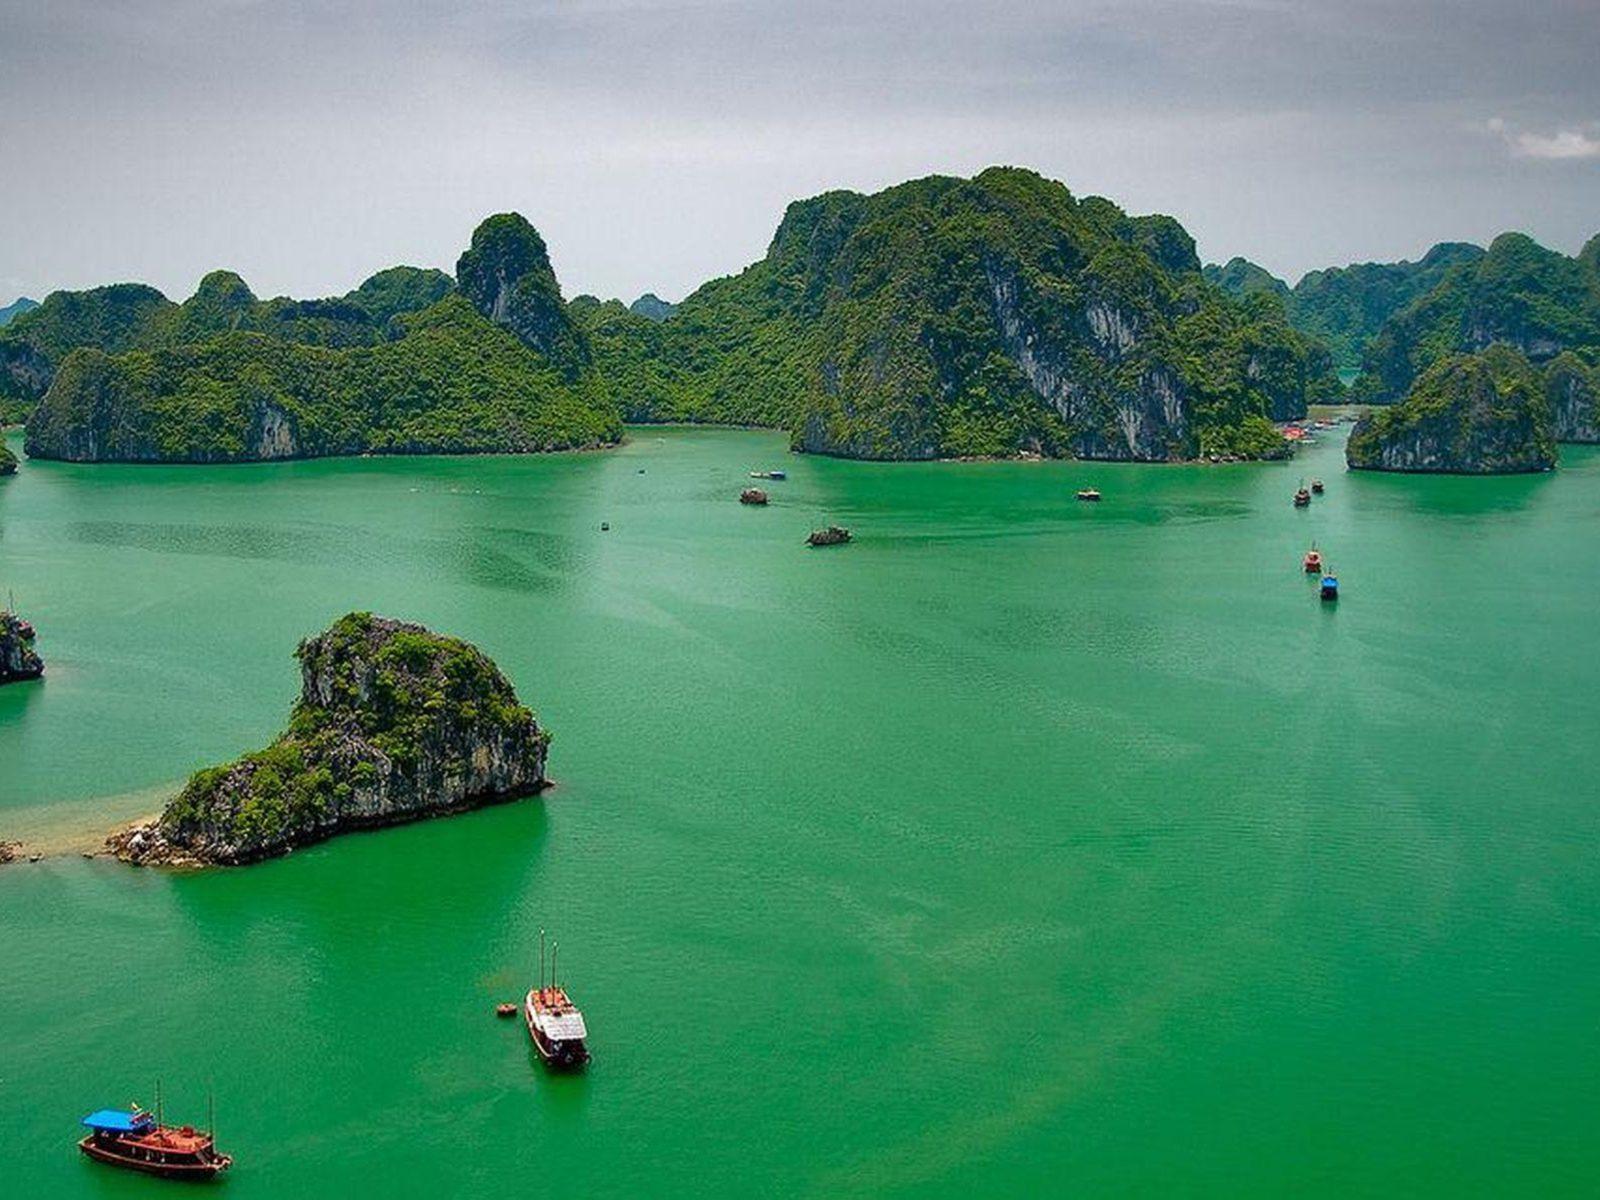 Hd 1080p Christmas Wallpaper Ha Long Bay Vietnam 157163 Wallpapers13 Com